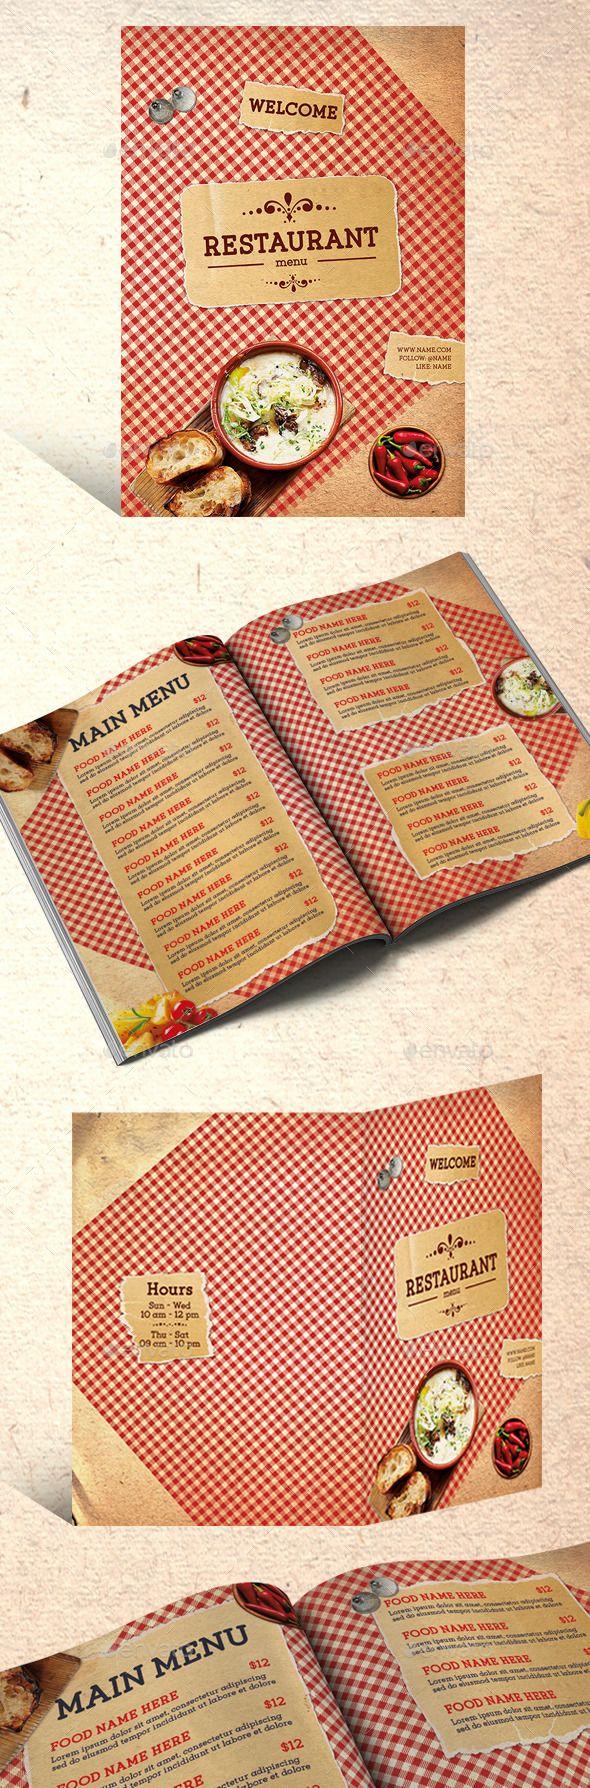 Restaurant Menu — Photoshop PSD #quality #barbecue • Available here → https://graphicriver.net/item/restaurant-menu/11778364?ref=pxcr